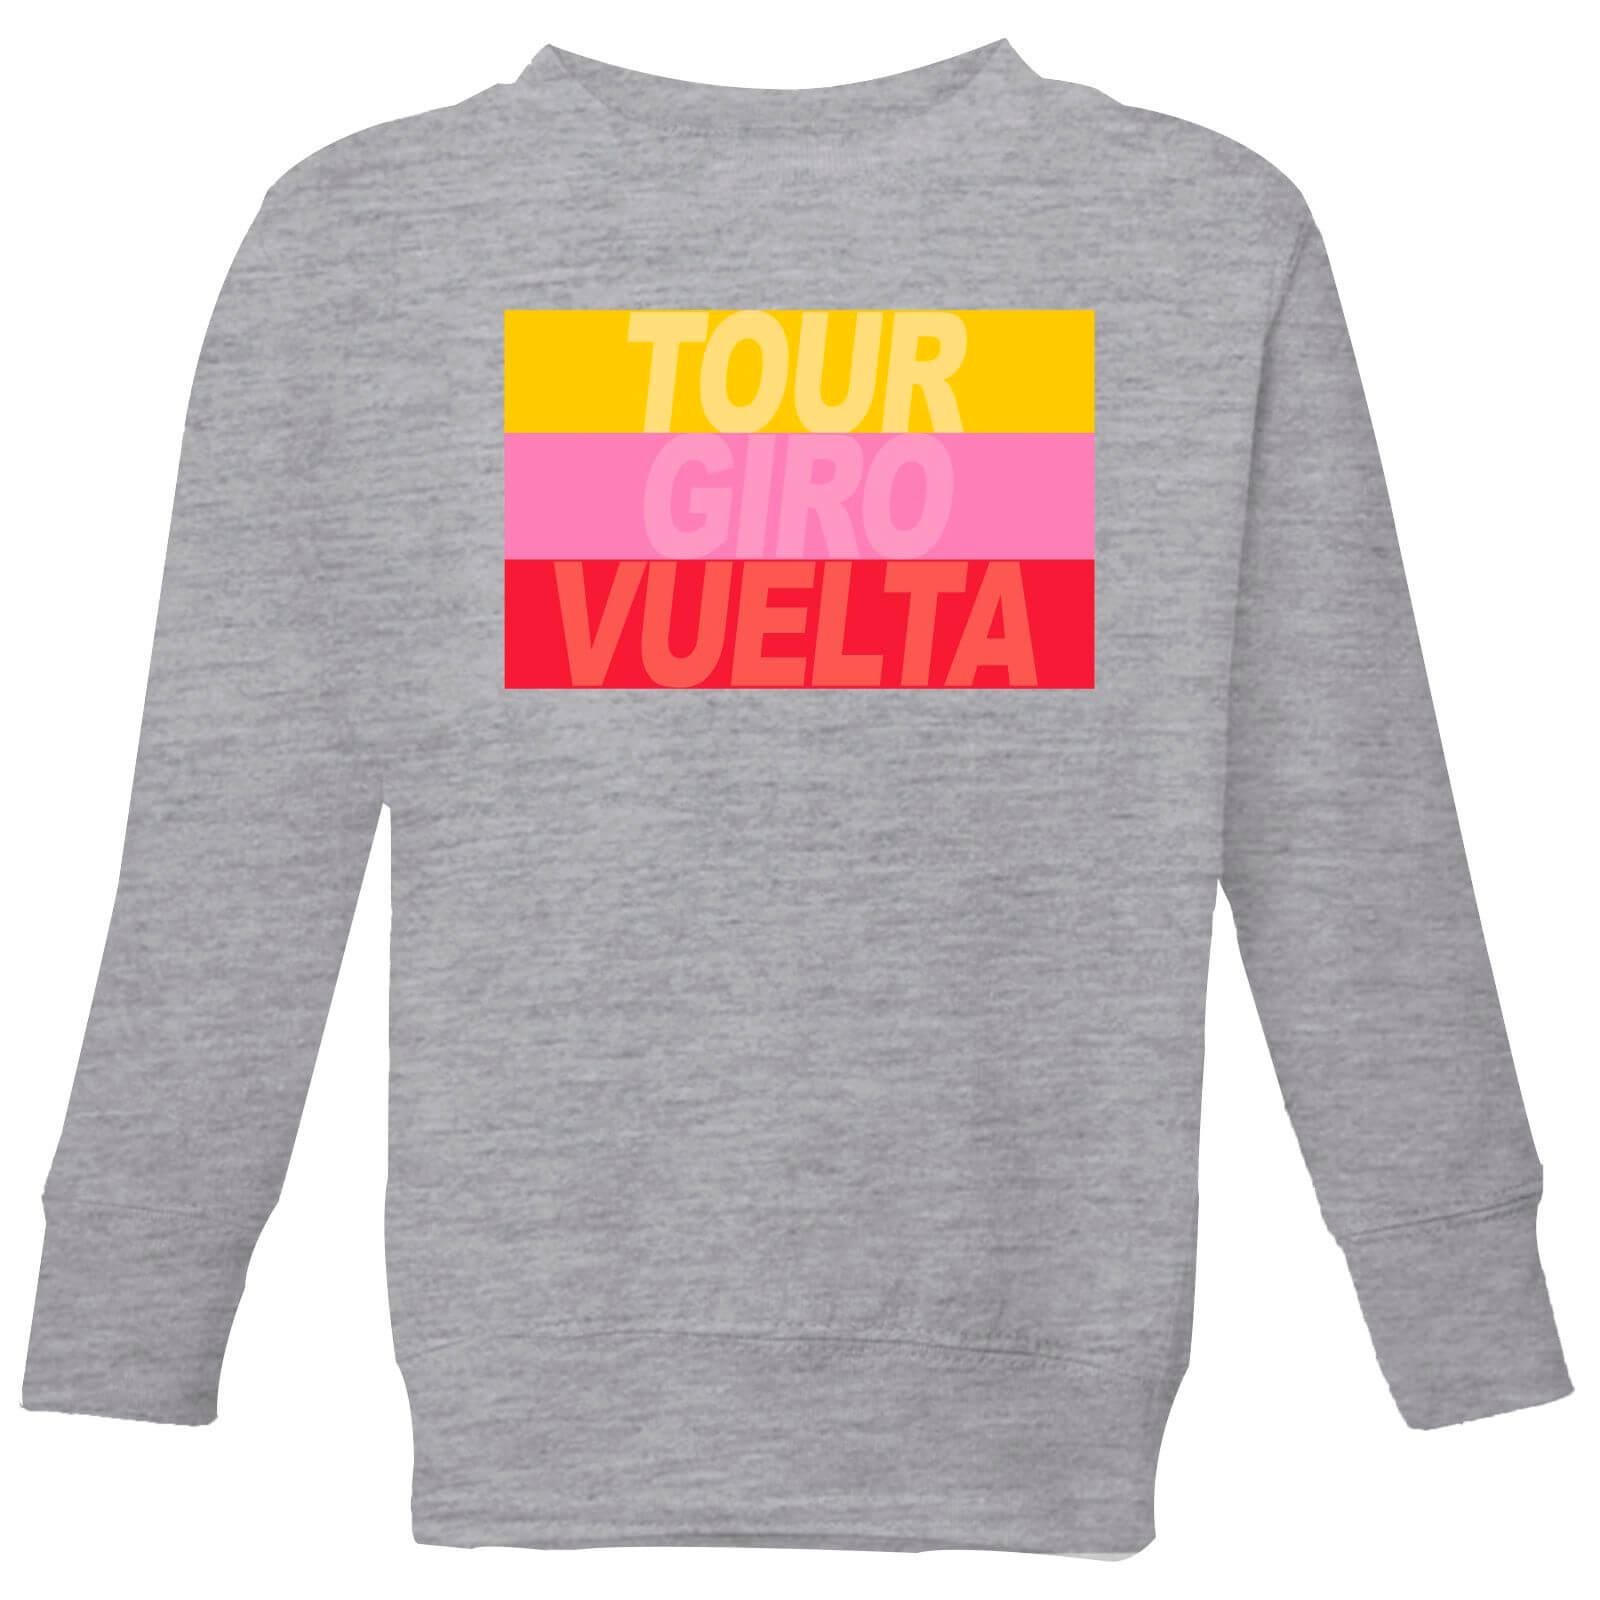 Summit Finish Grand Tour Stripes Kids' Sweatshirt - Grey - 7-8 Jahre - Grau